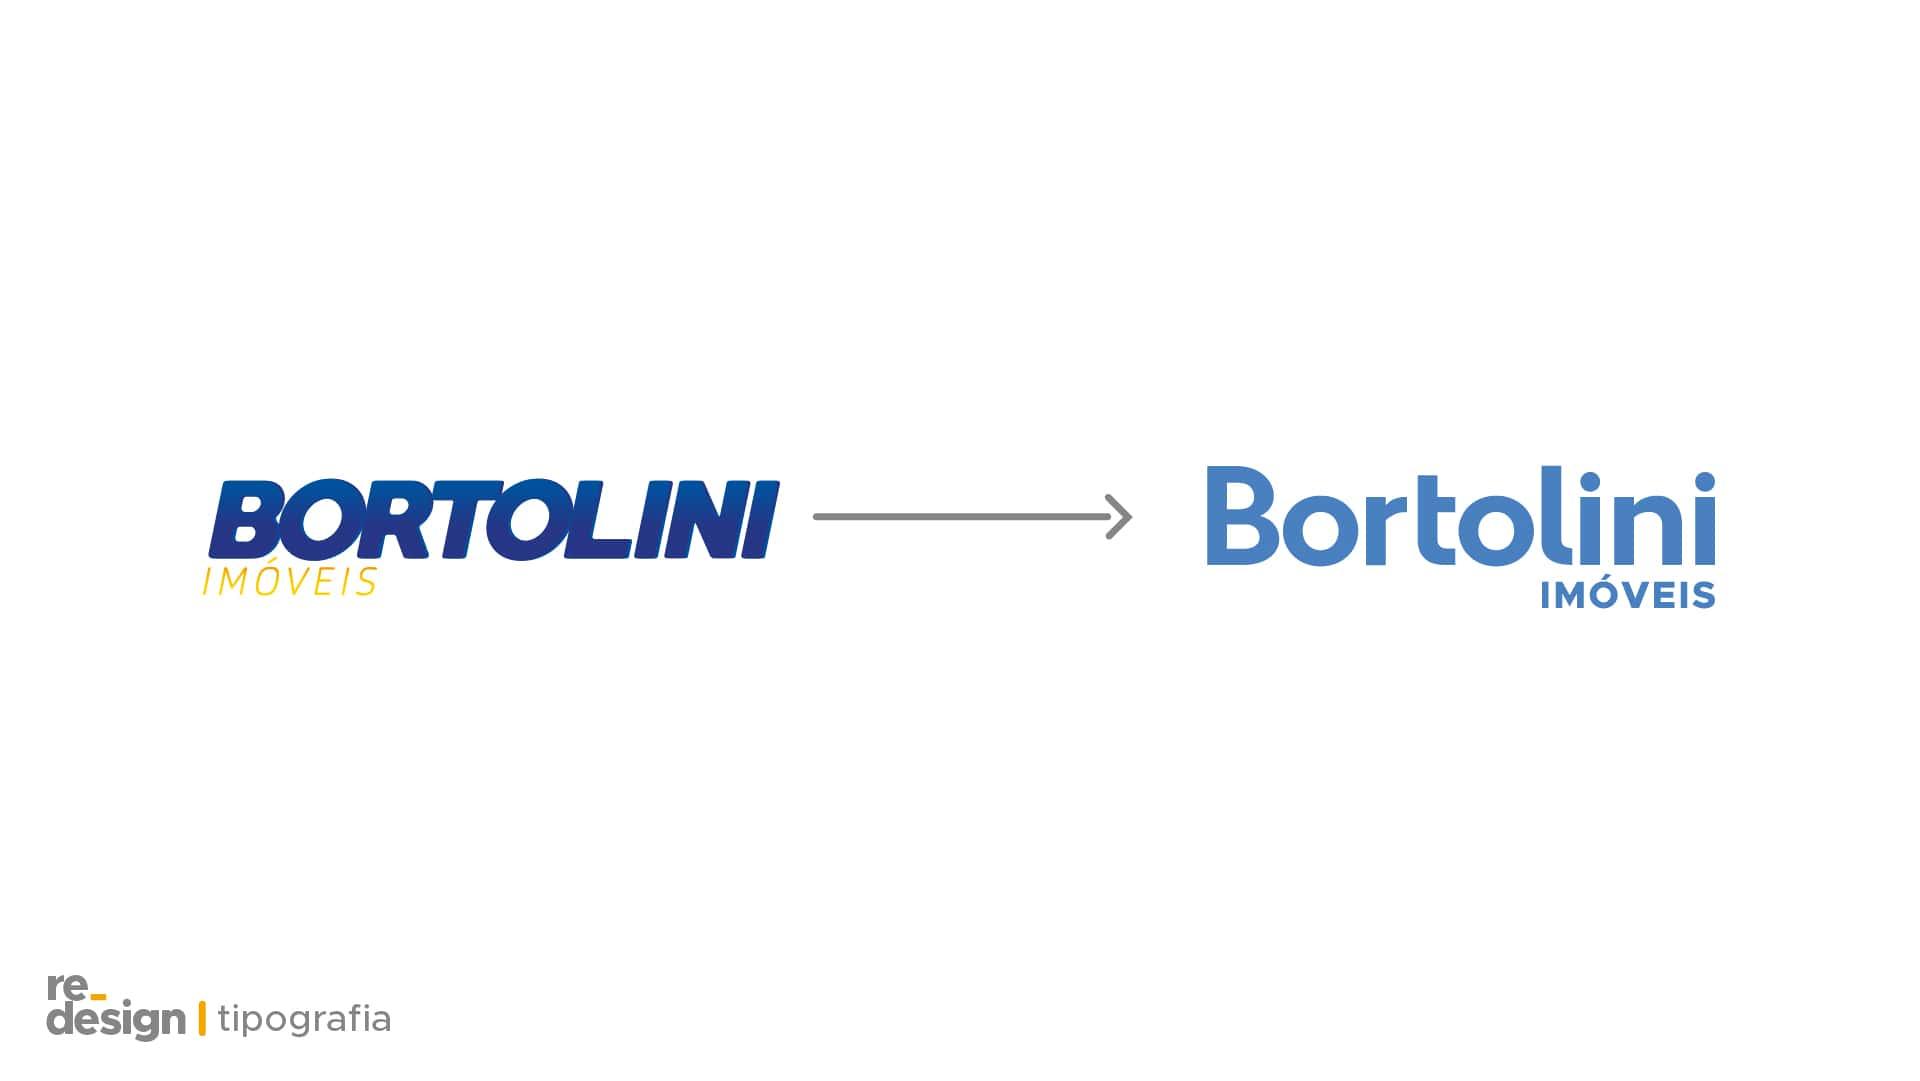 Bortolini Imóveis